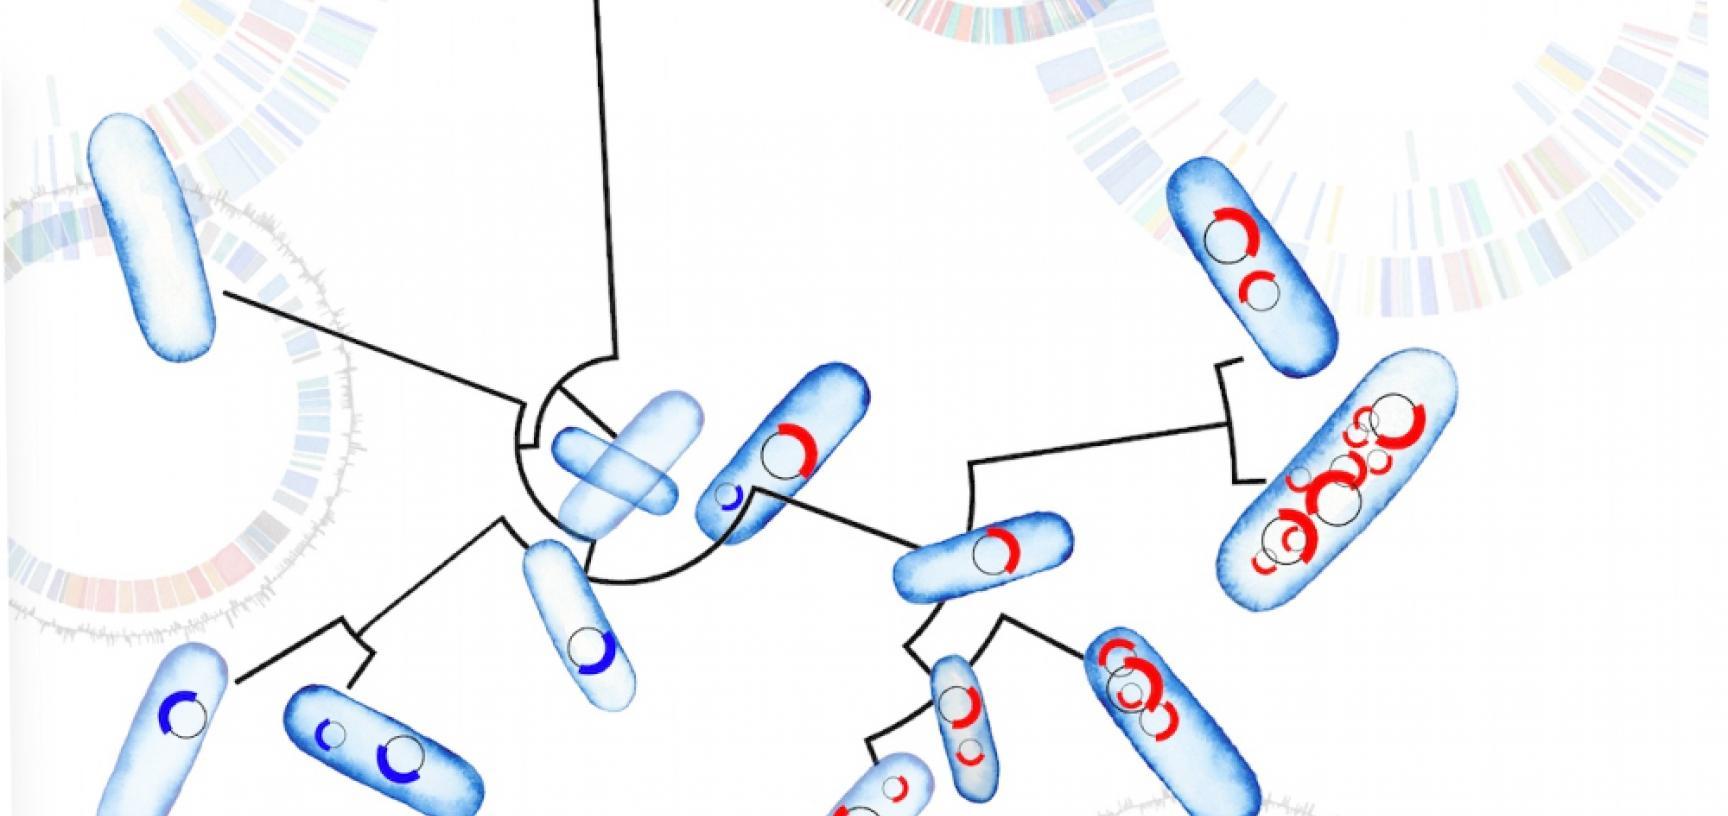 plasmid picture